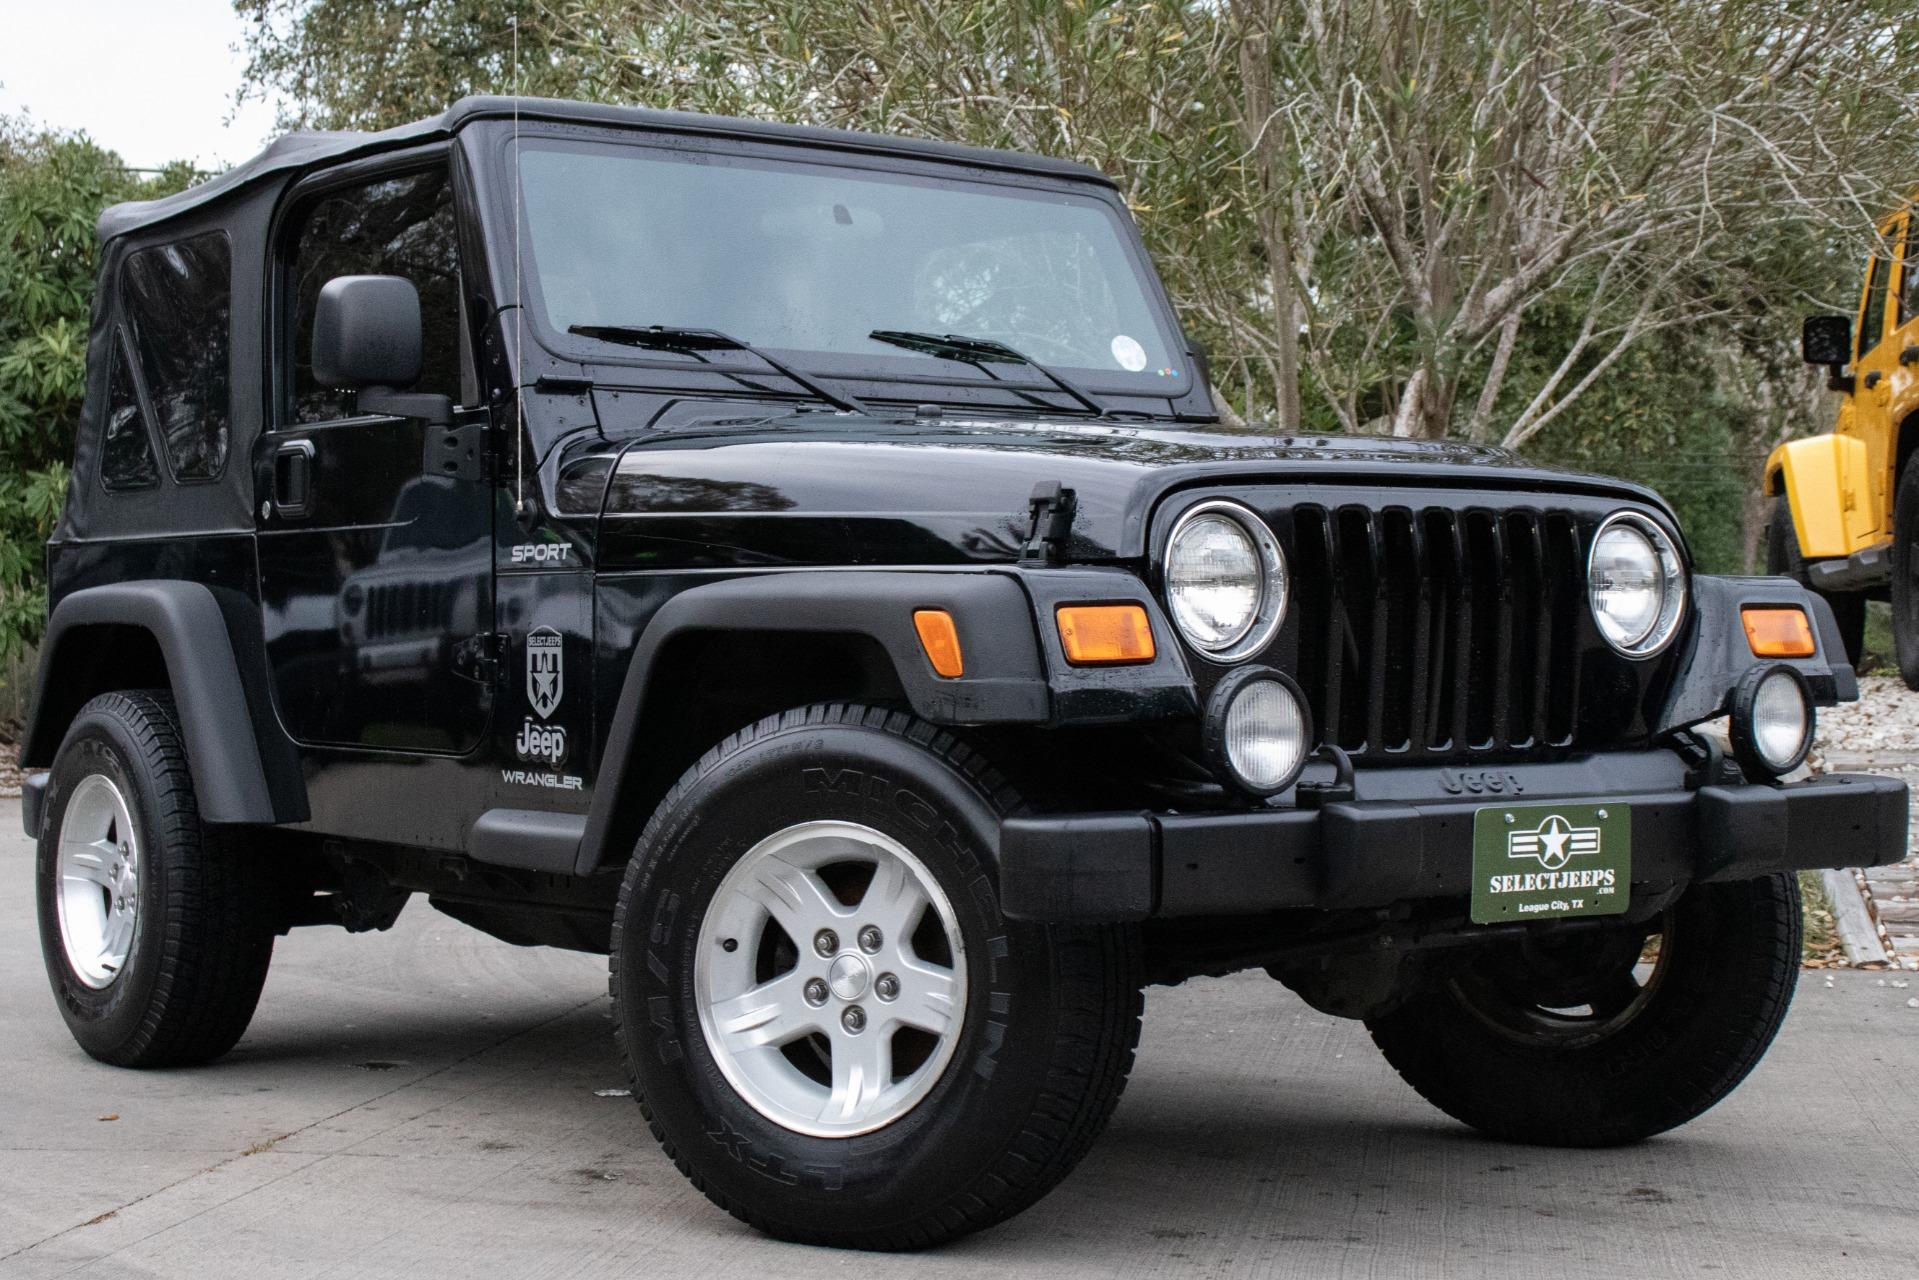 Used-2004-Jeep-Wrangler-Sport